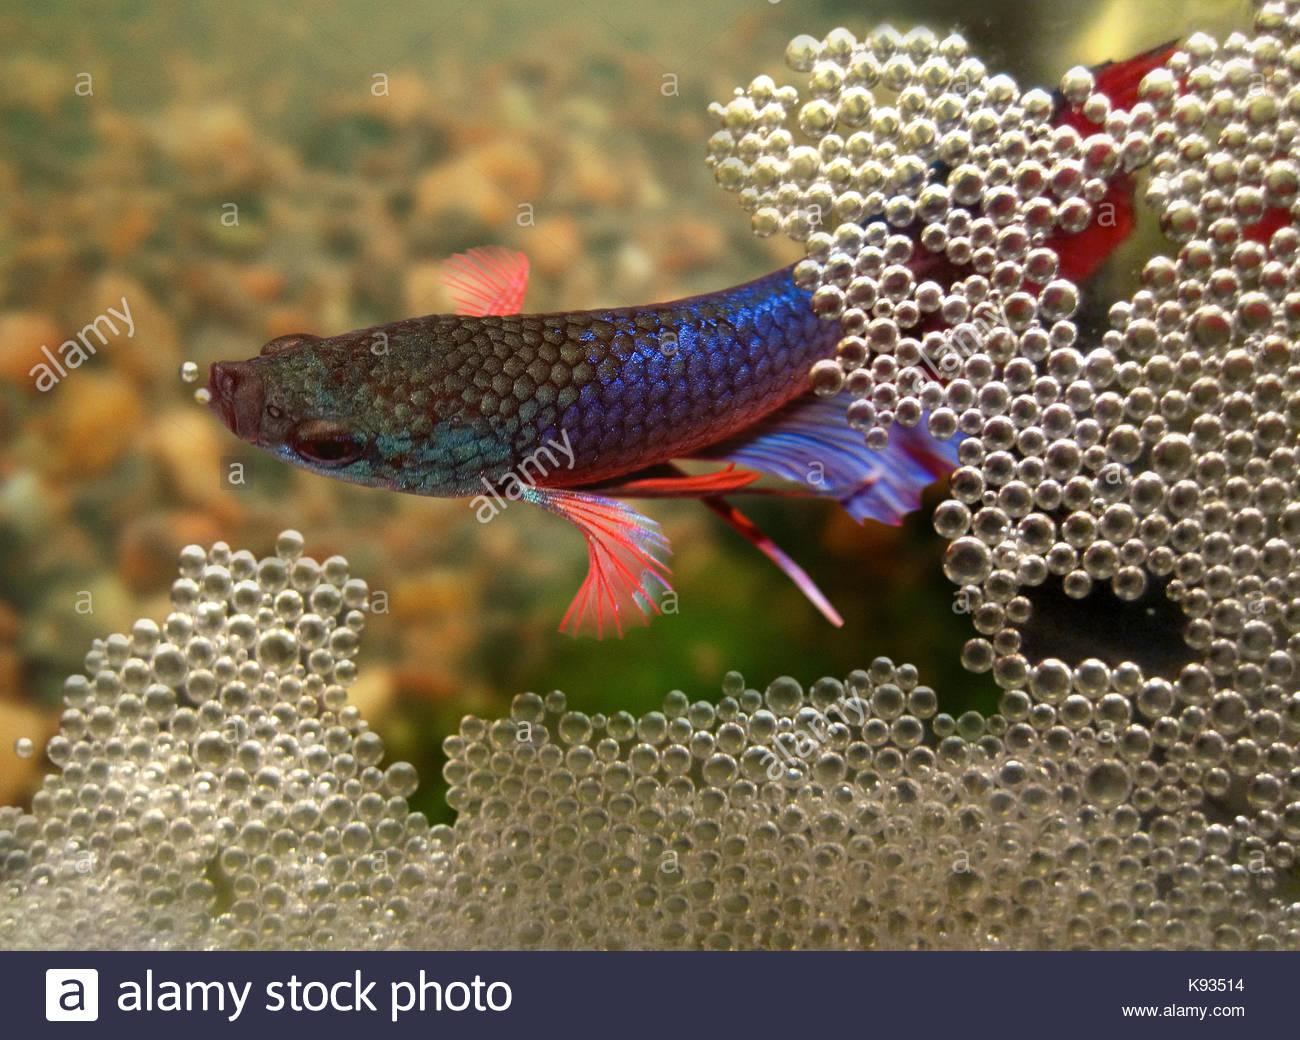 Betta fish aquarium stock photos betta fish aquarium for Bubbles in betta fish tank